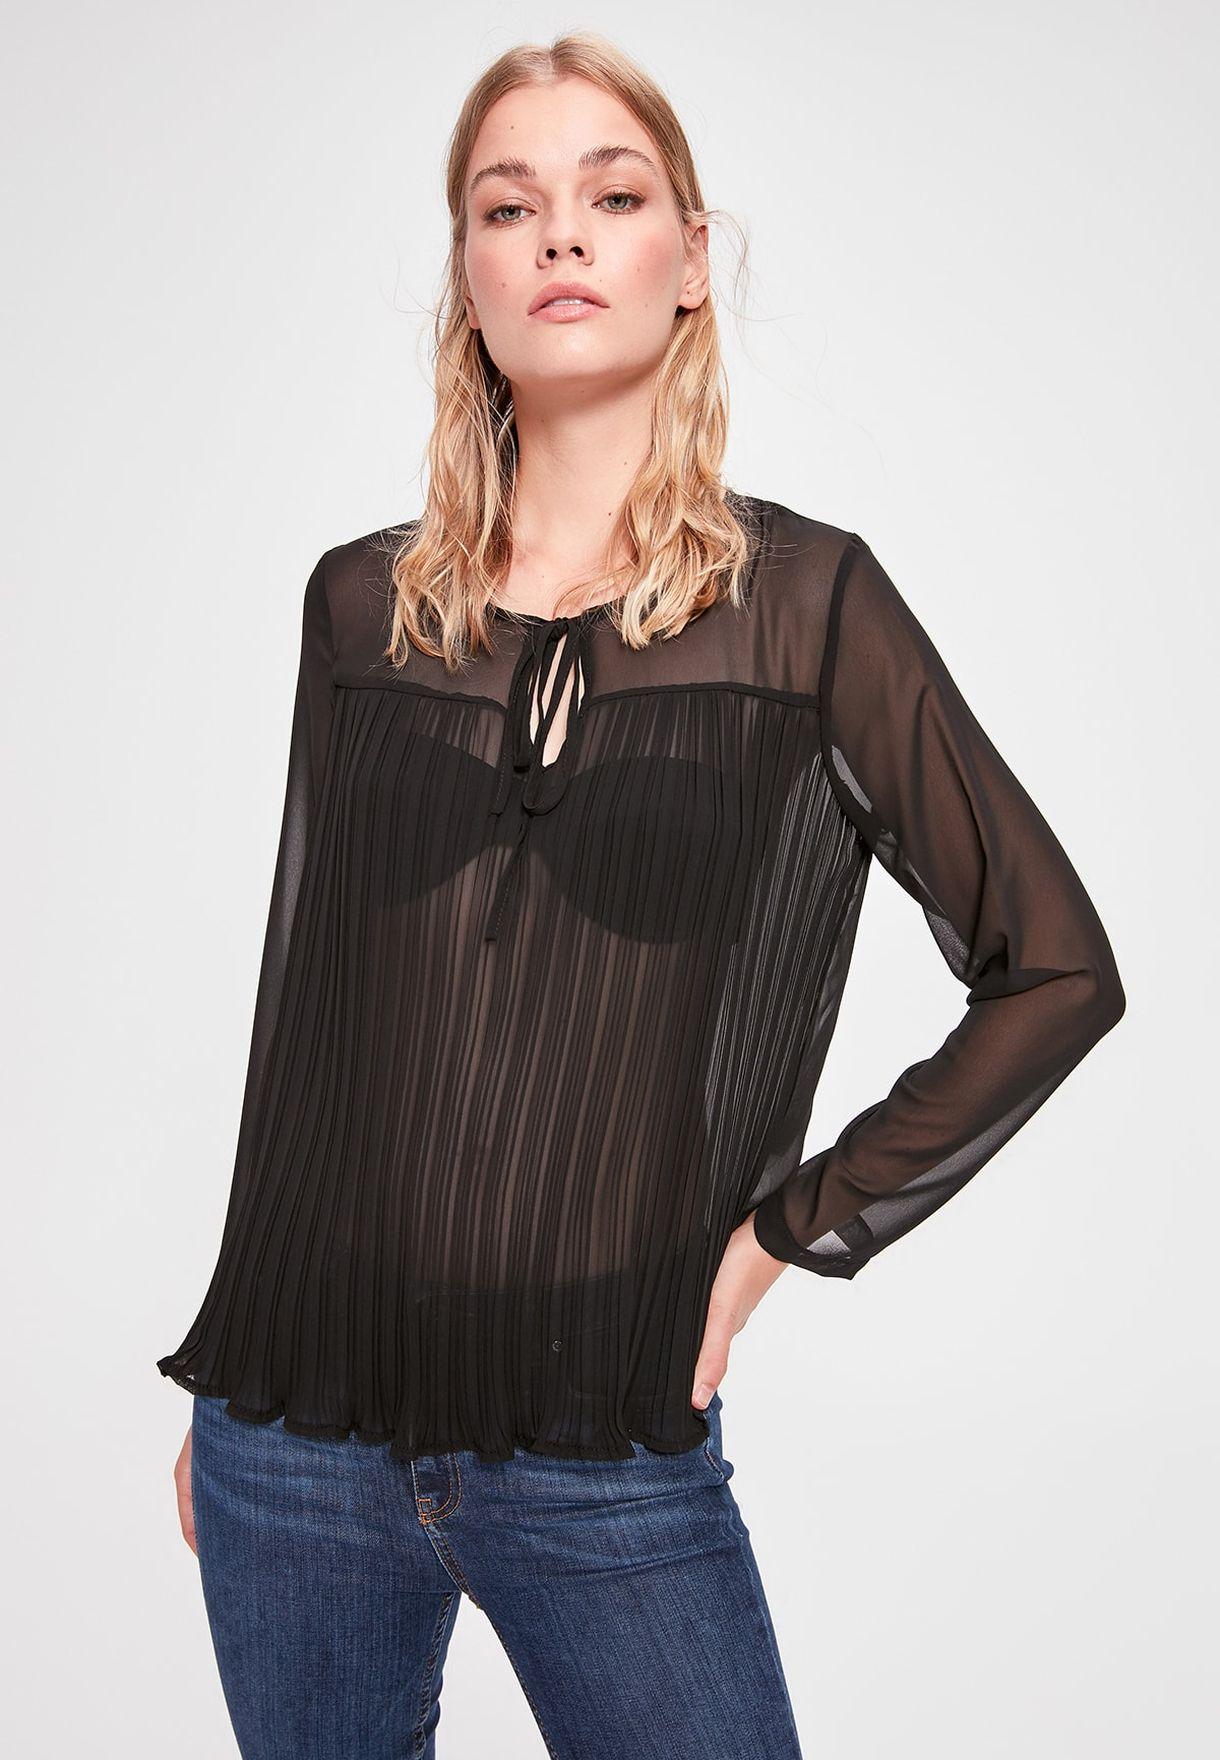 Buy Trendyol Black Ruffle Hem Sheer Top For Women, Uae 27680atkkbcp